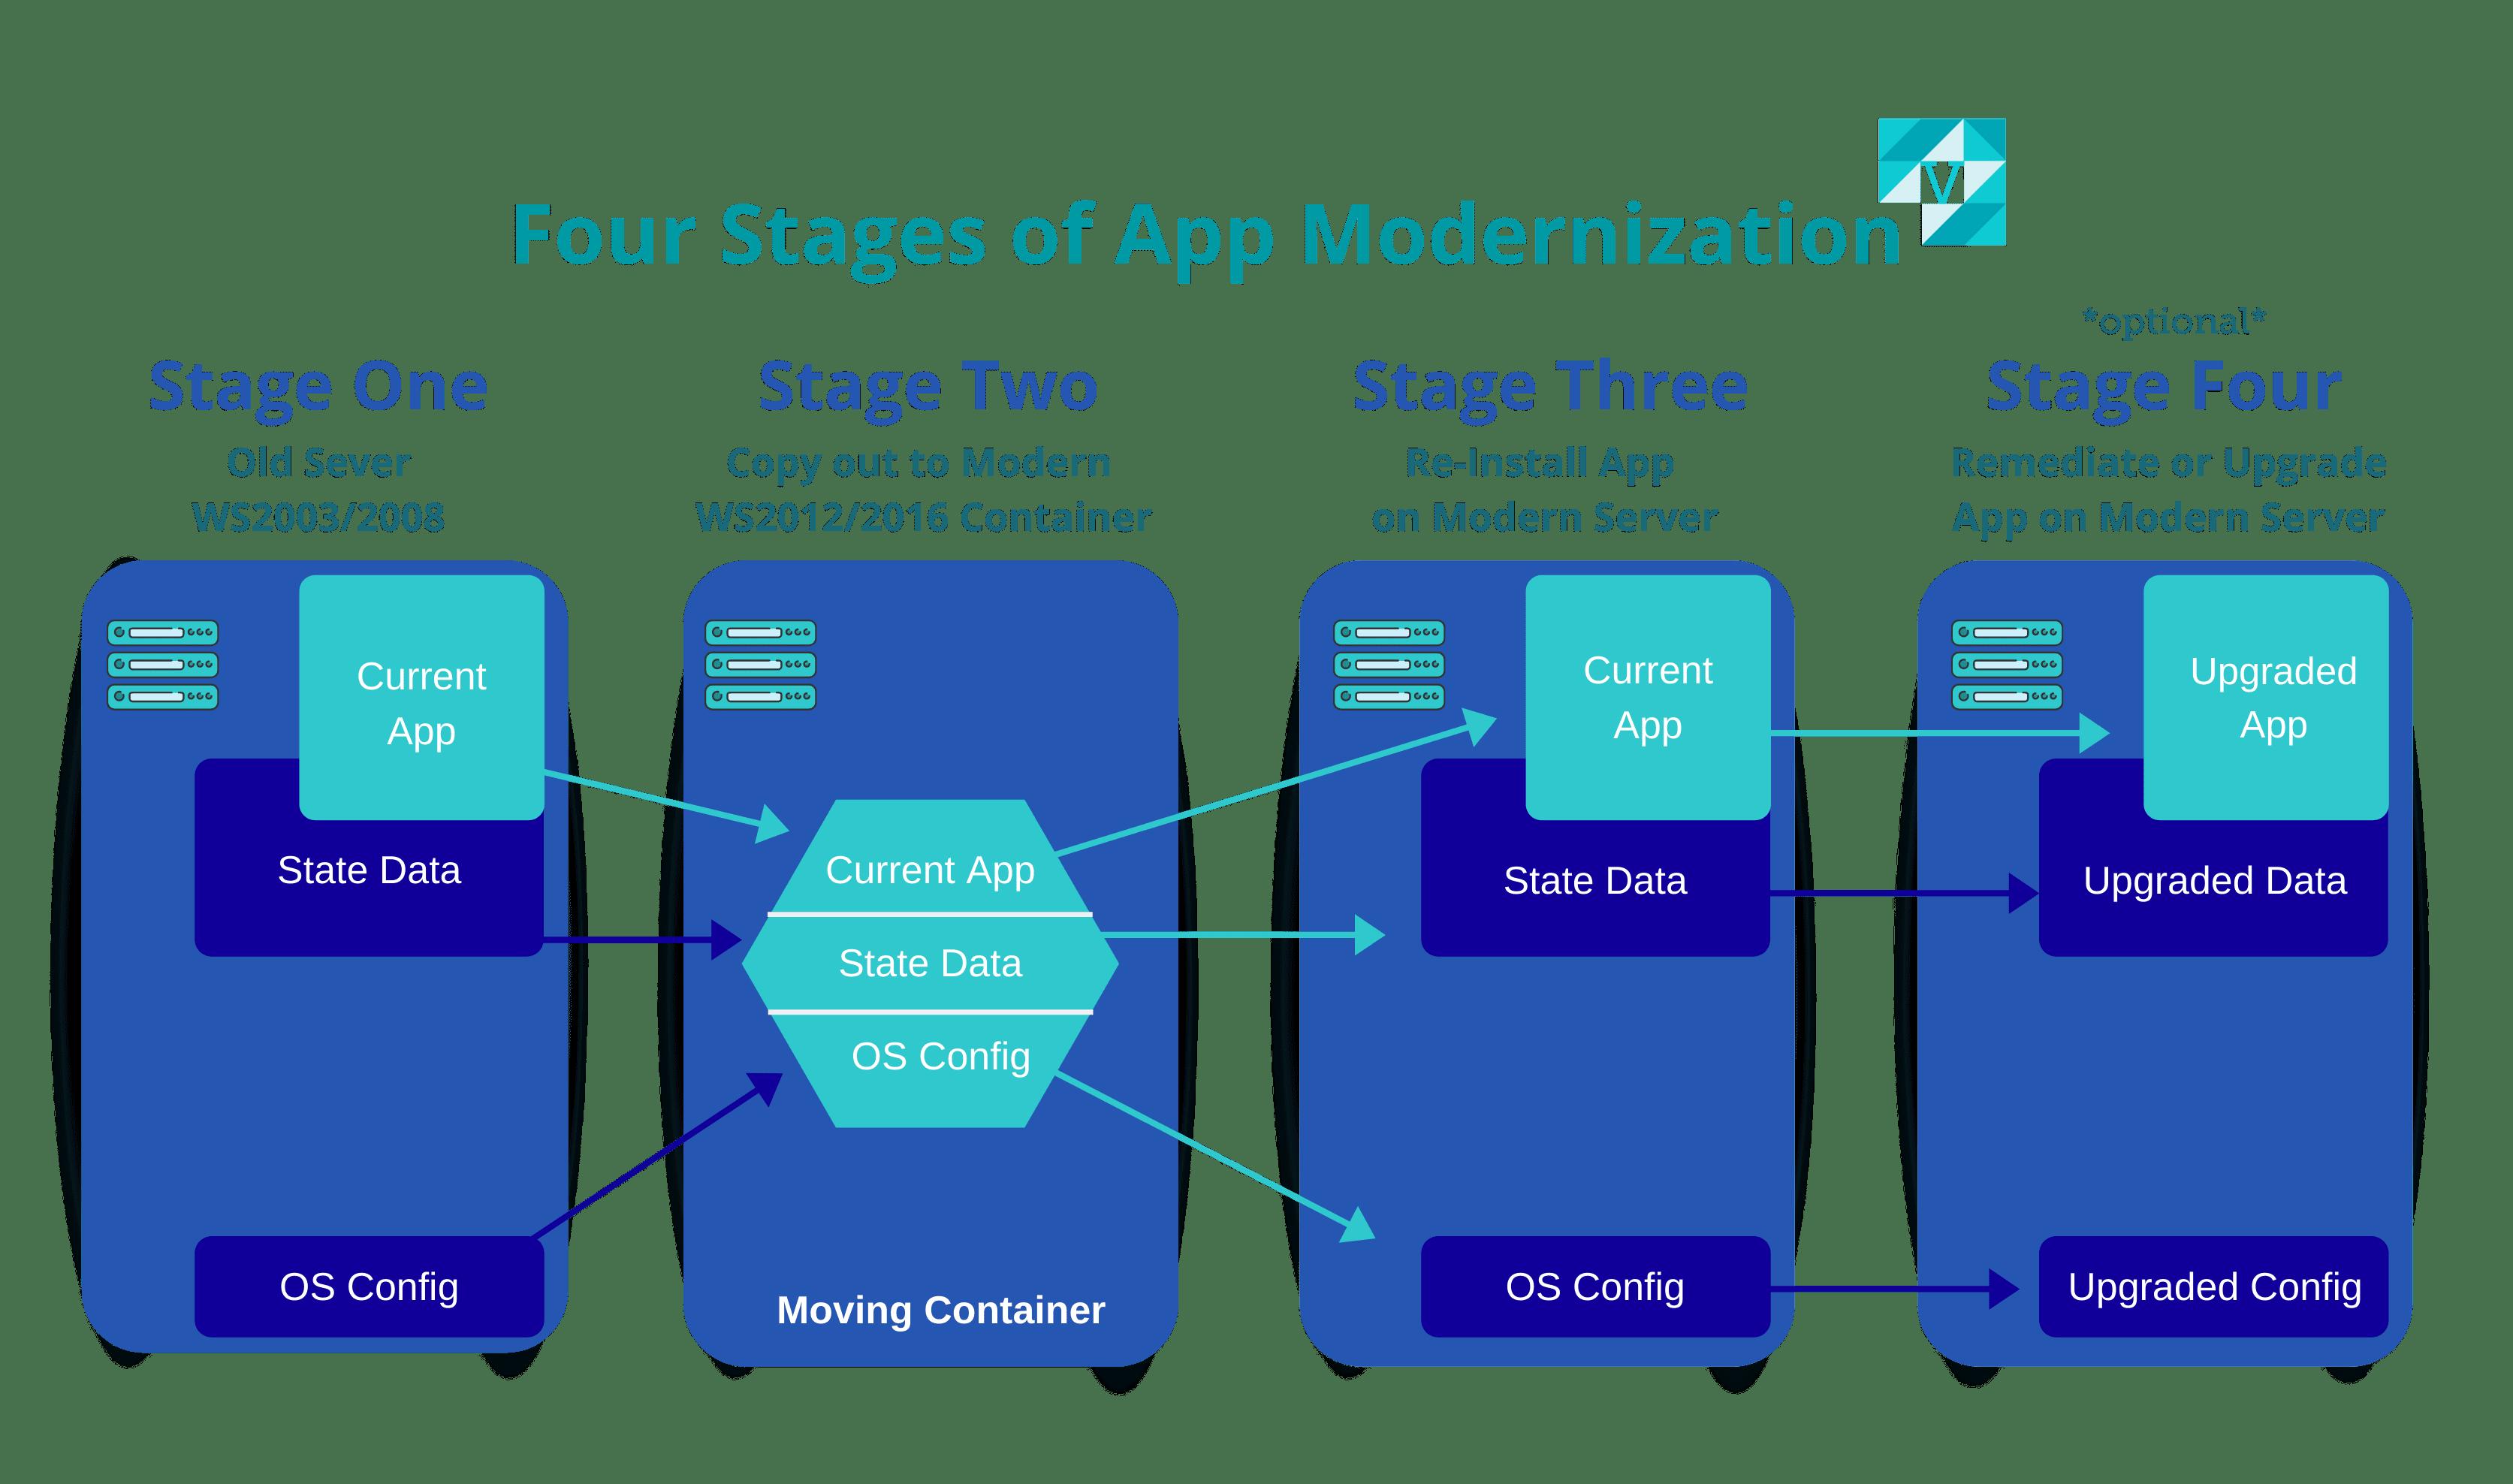 Four Stages of App Modernization